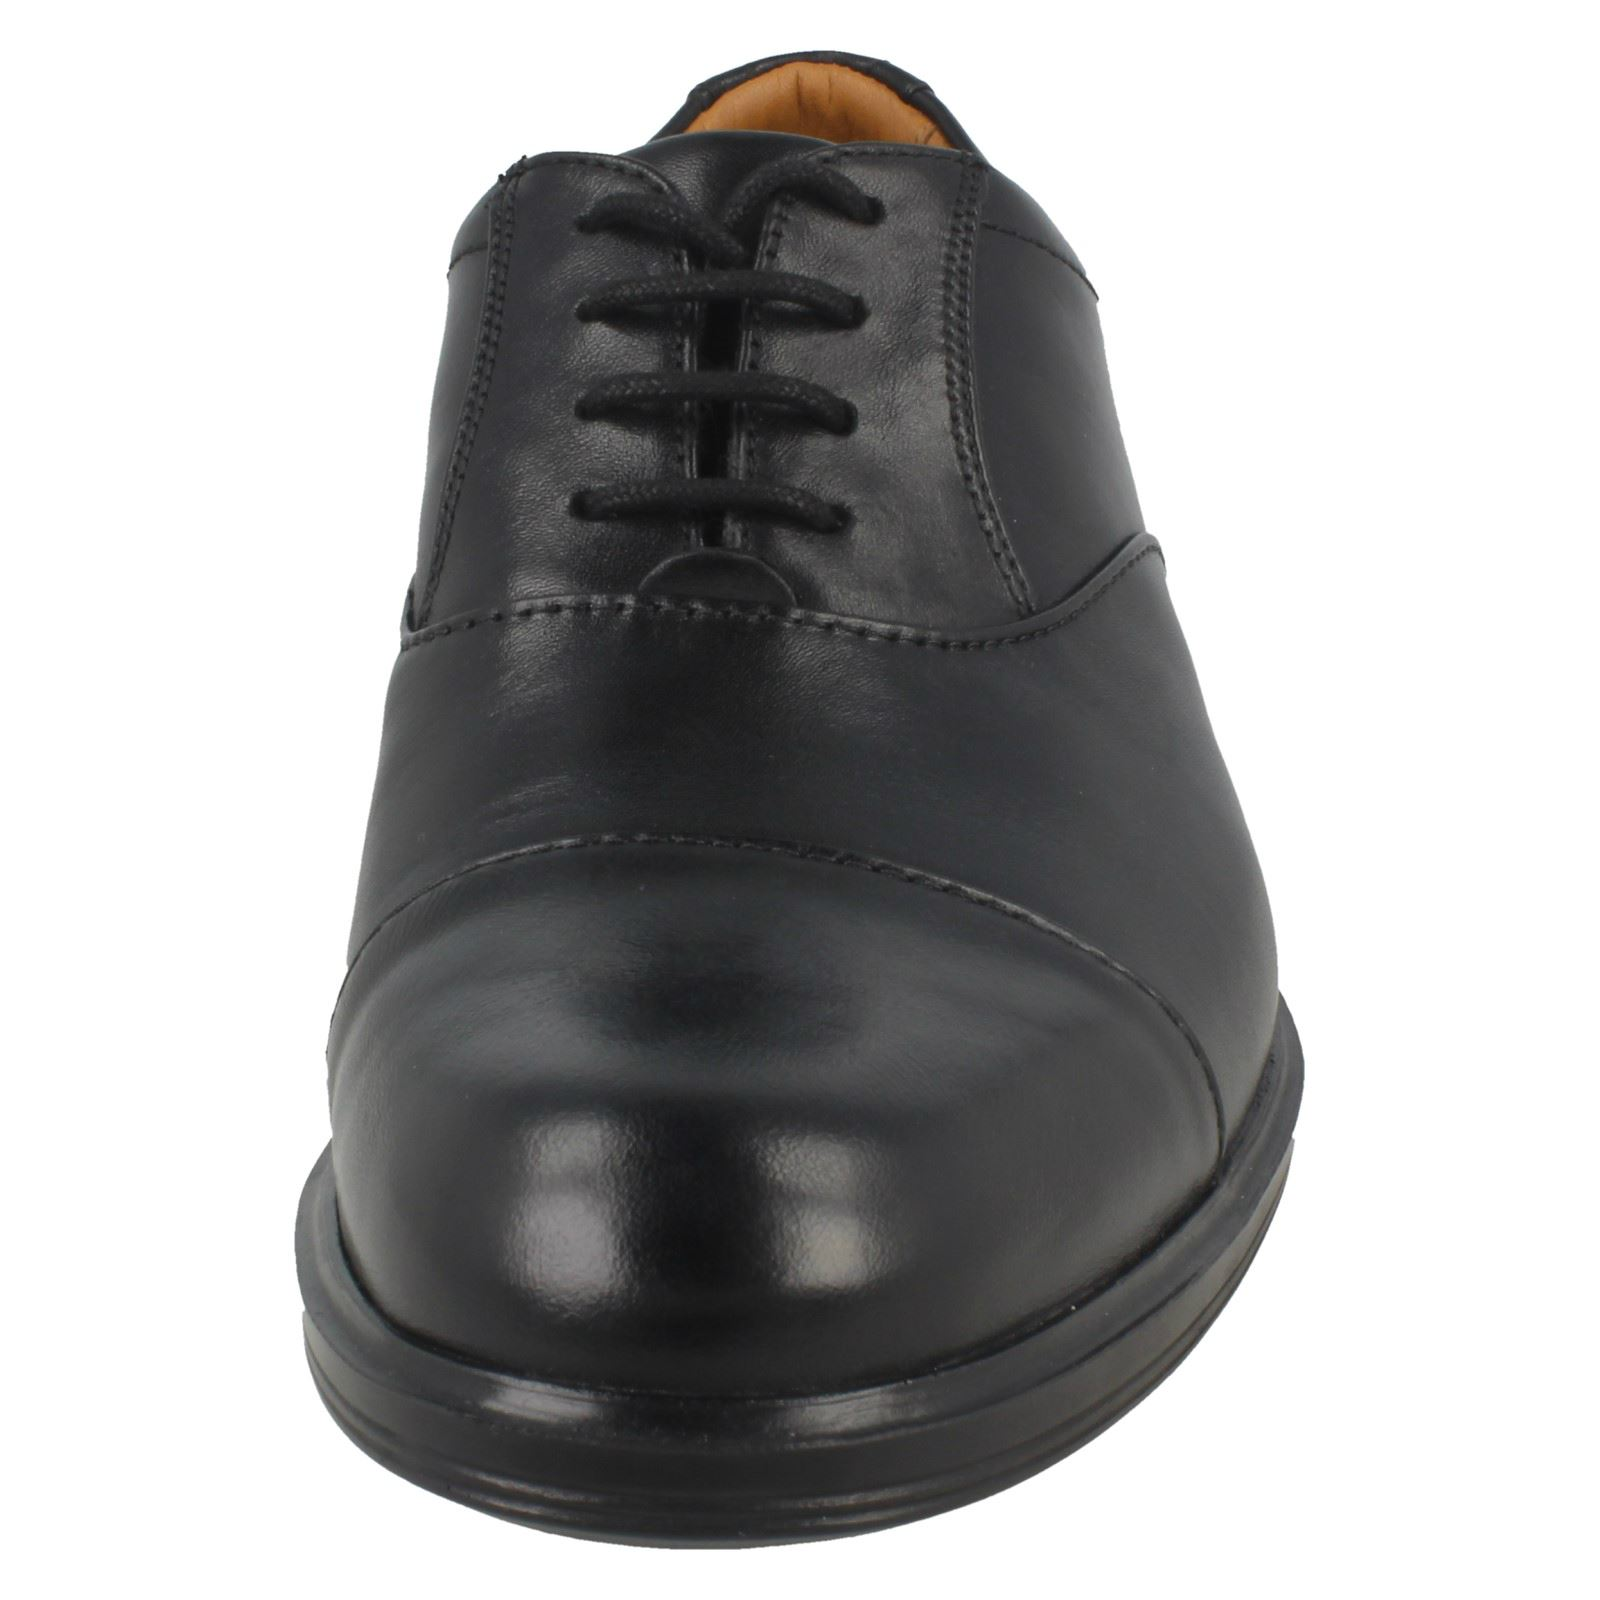 hombre Oxford cordones para de Clarks negro gorra con gabson formales RAwXgq7